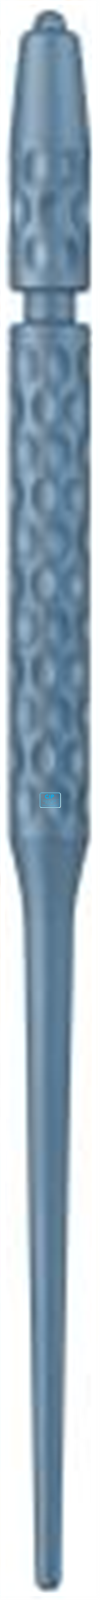 AESCULAP SCALPELHEFT TITANIUM BB-045T